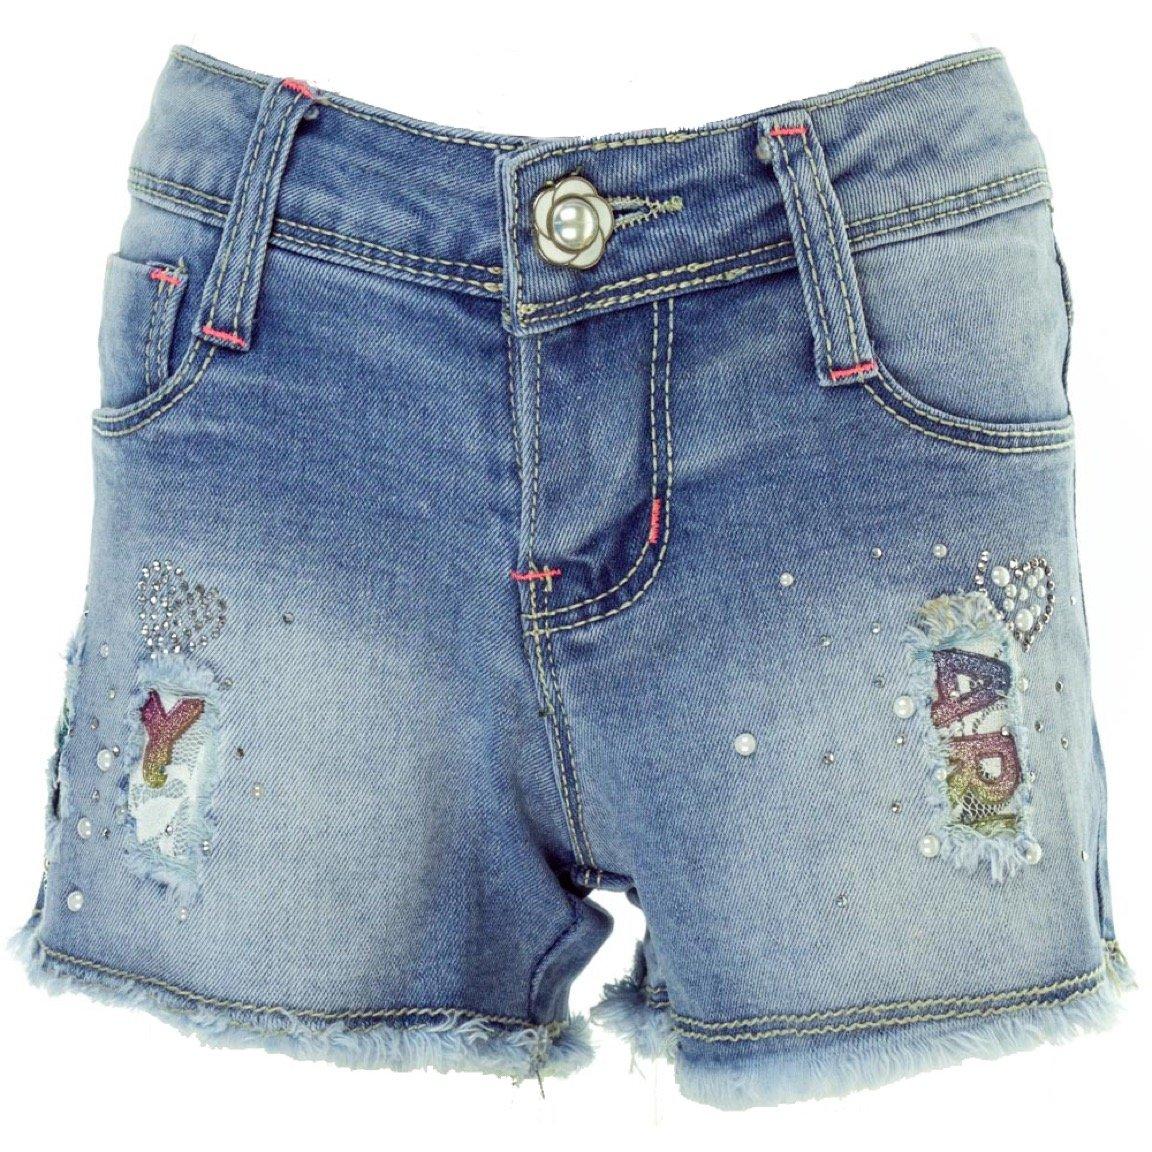 Ativo παιδικό παντελόνι τζιν σορτς «Strass Denim»